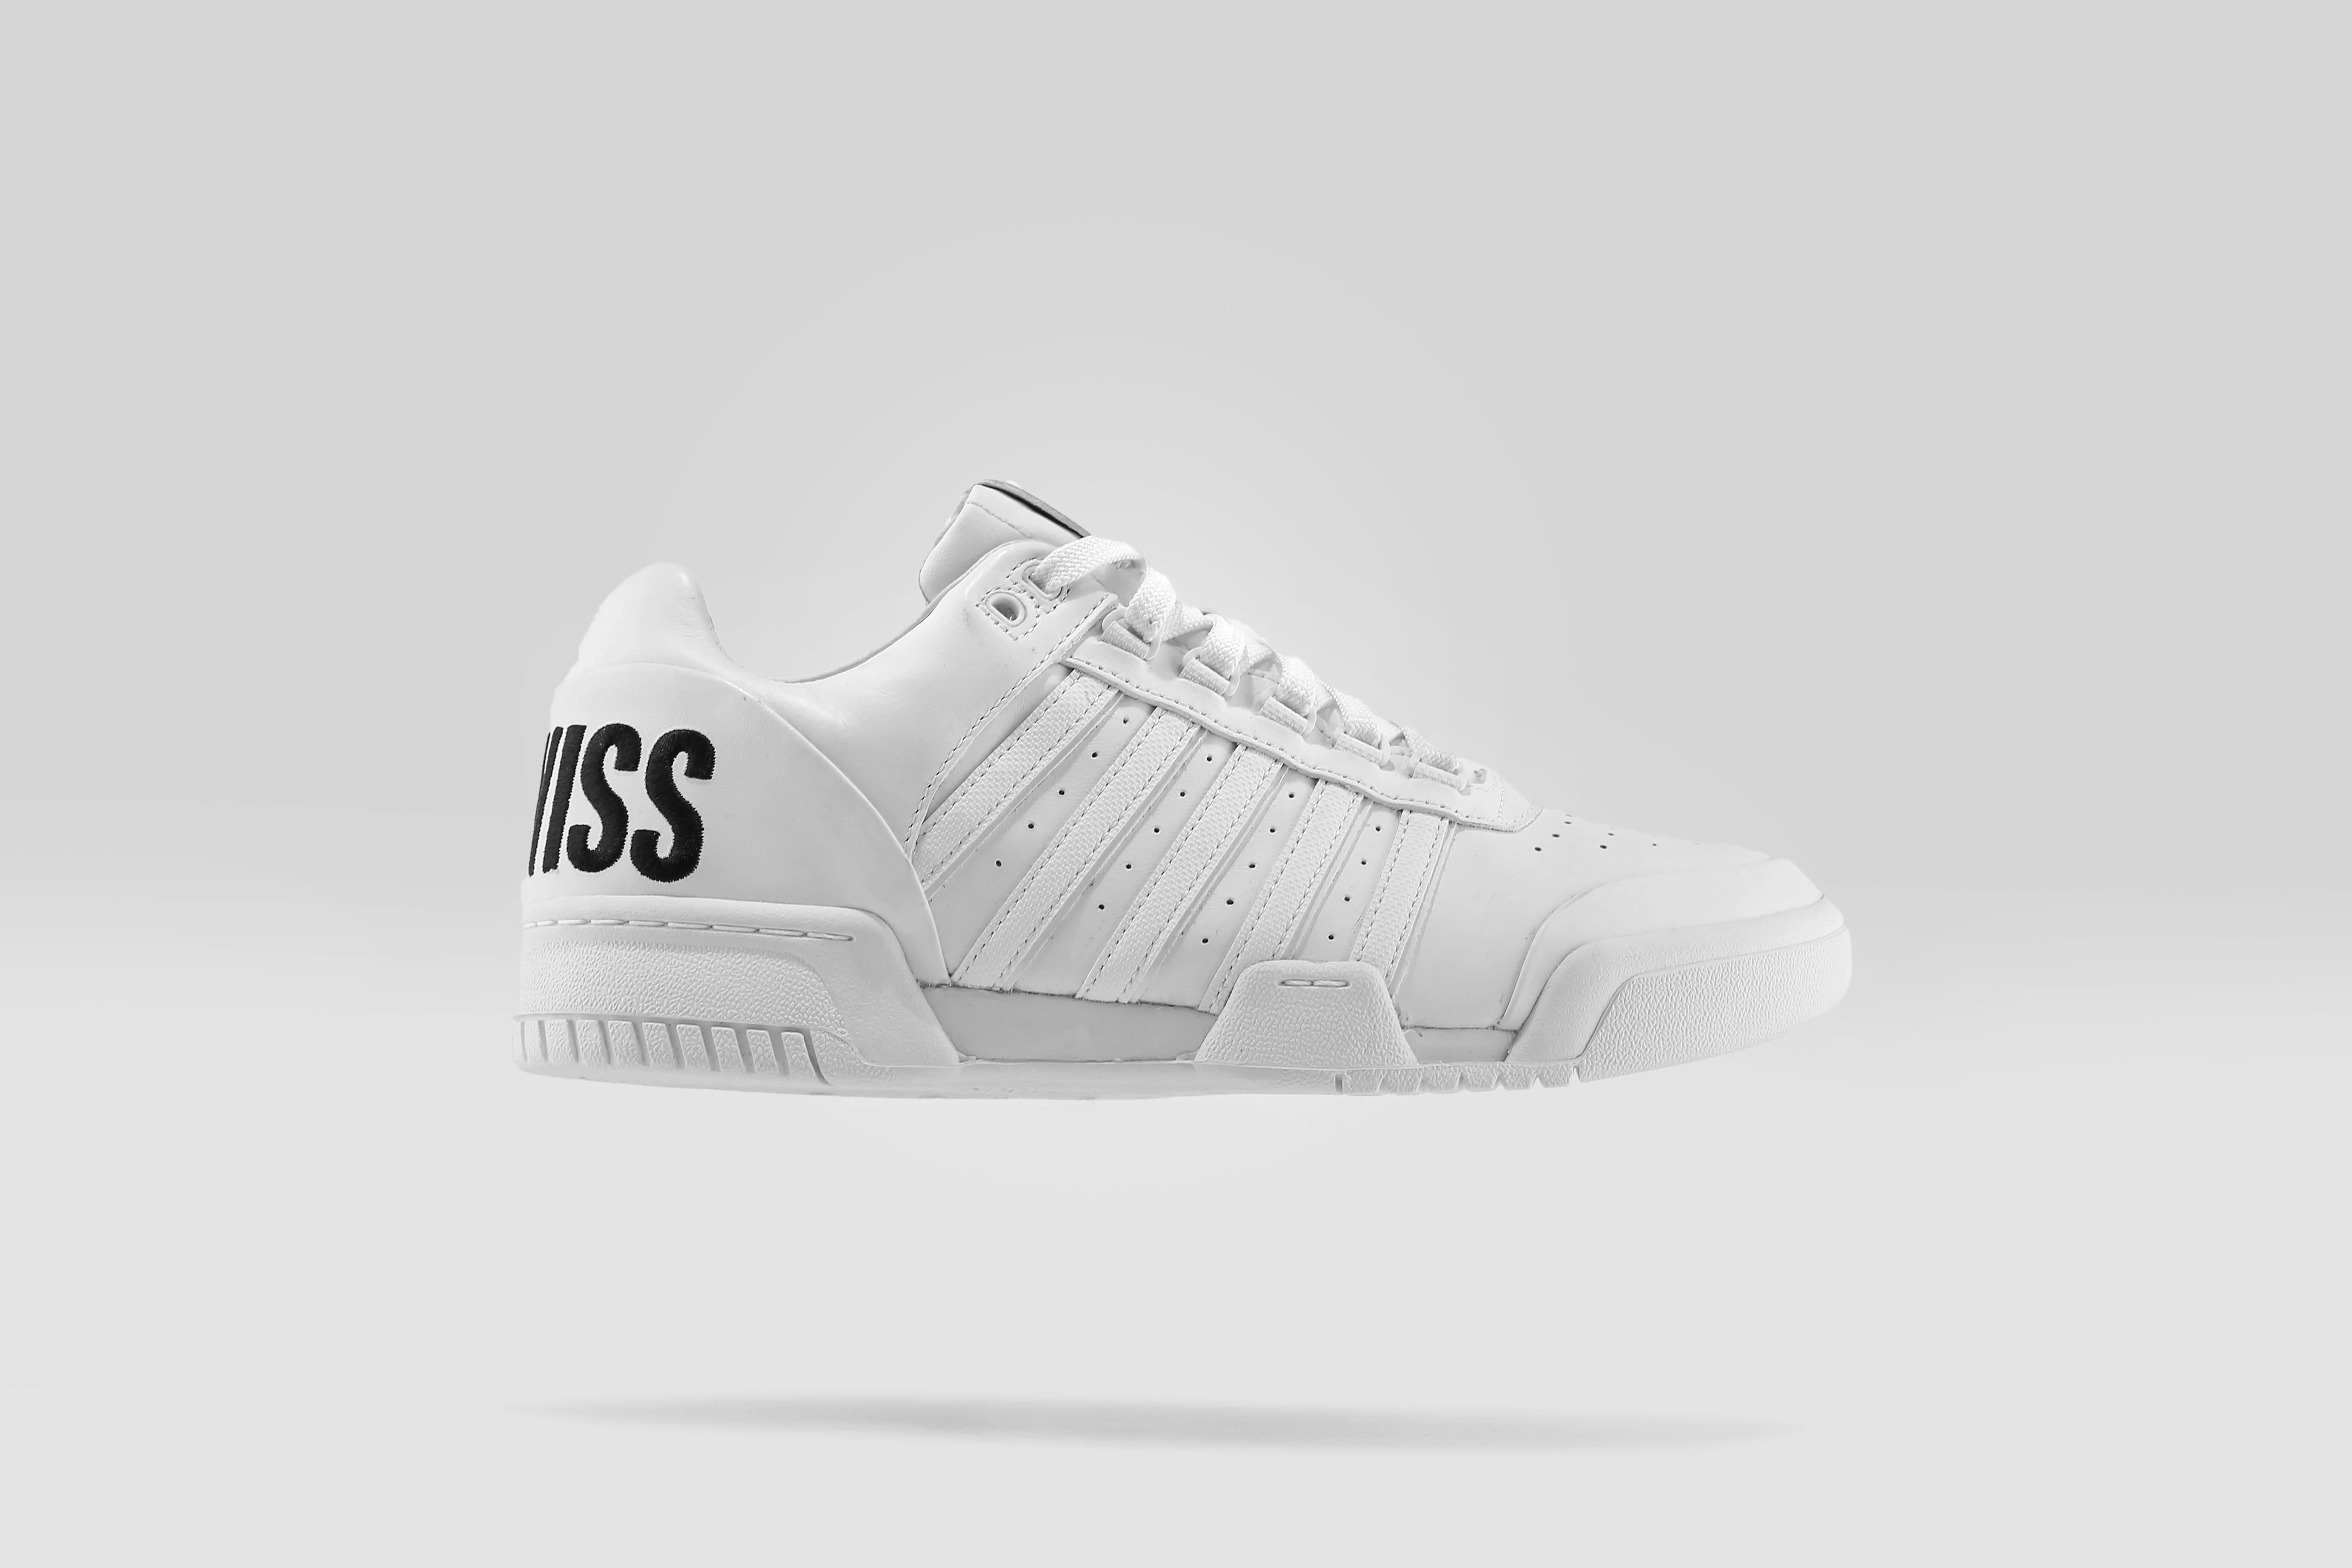 k swiss shoes black and white 2017 calendar